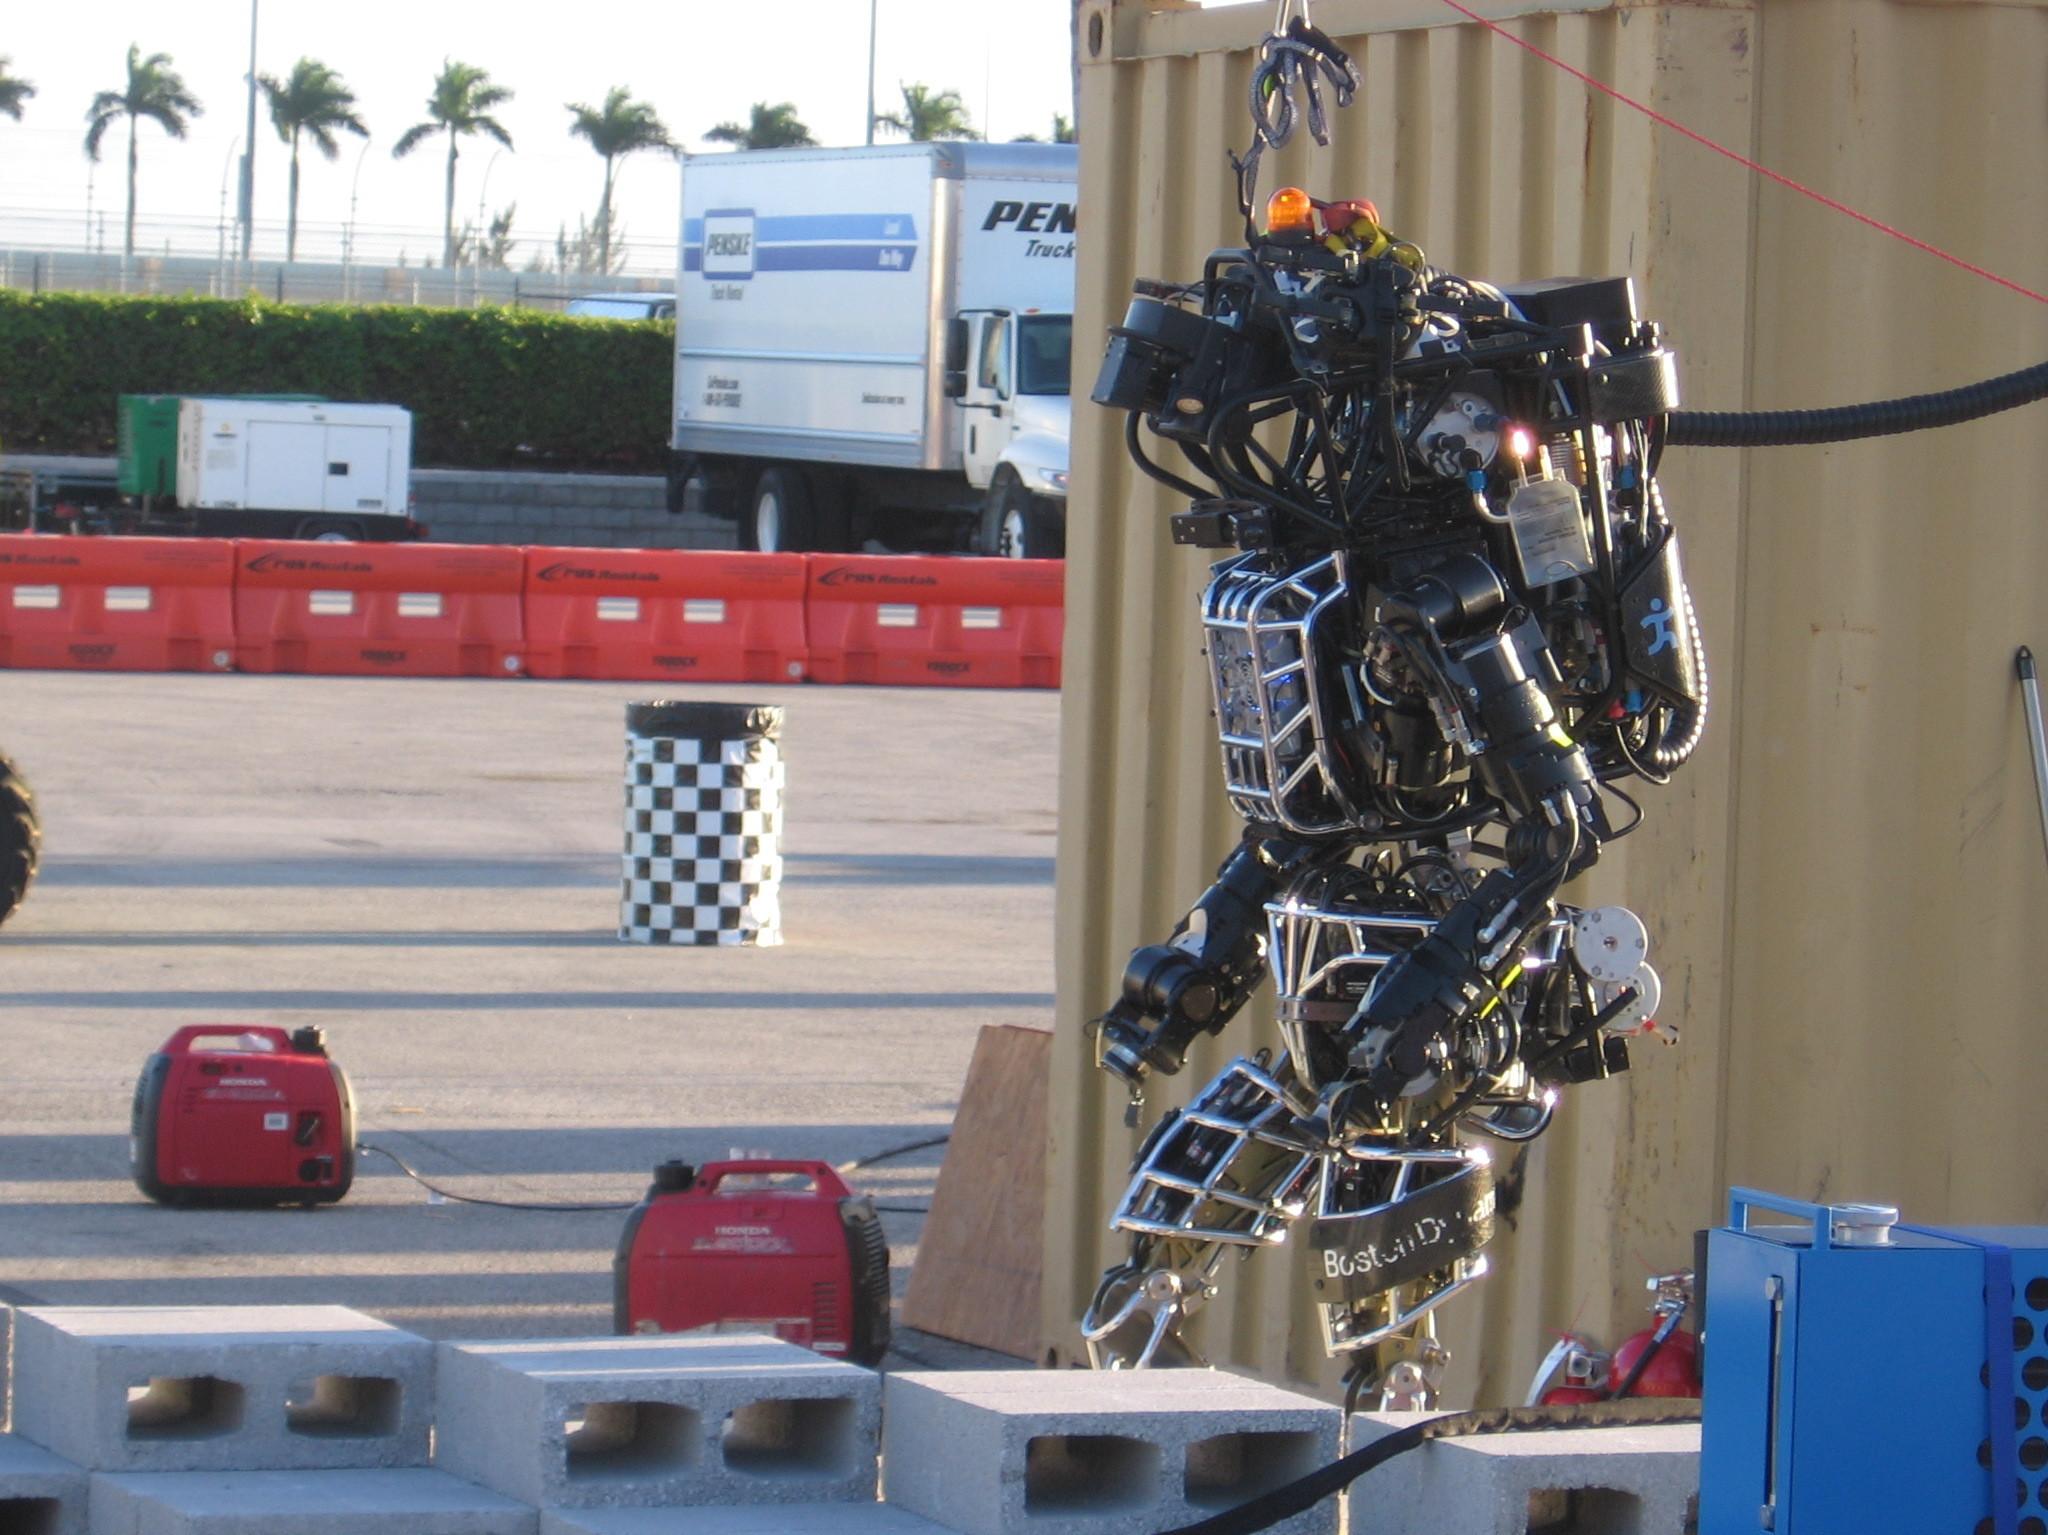 Robot 'Olympics' Test Machines On Human Skills